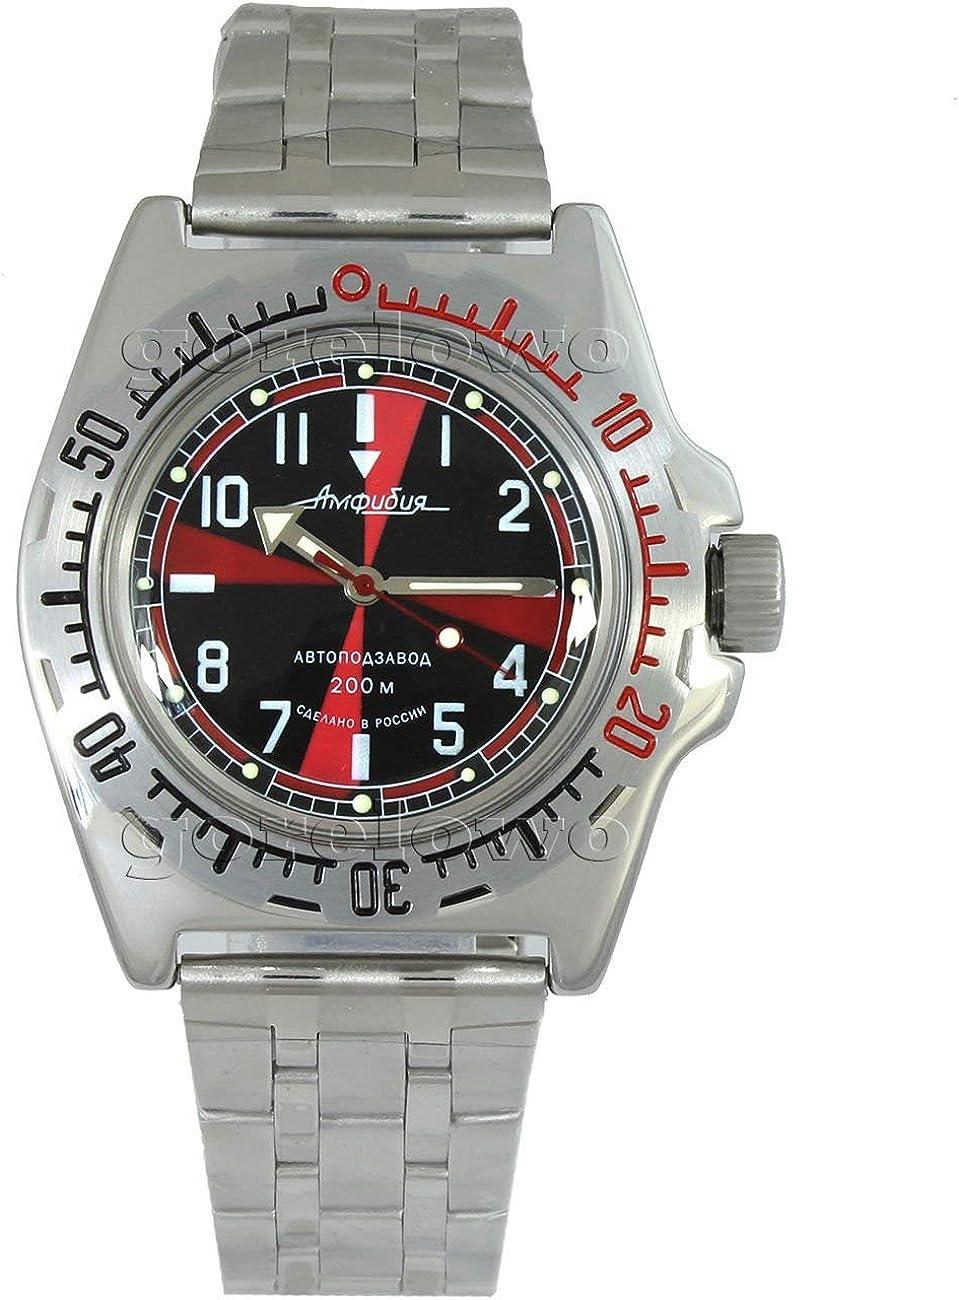 Vostok Amphibian 110650 2415b Scuba Diving Military Russian Watches Mechanical Automatic Mens Black